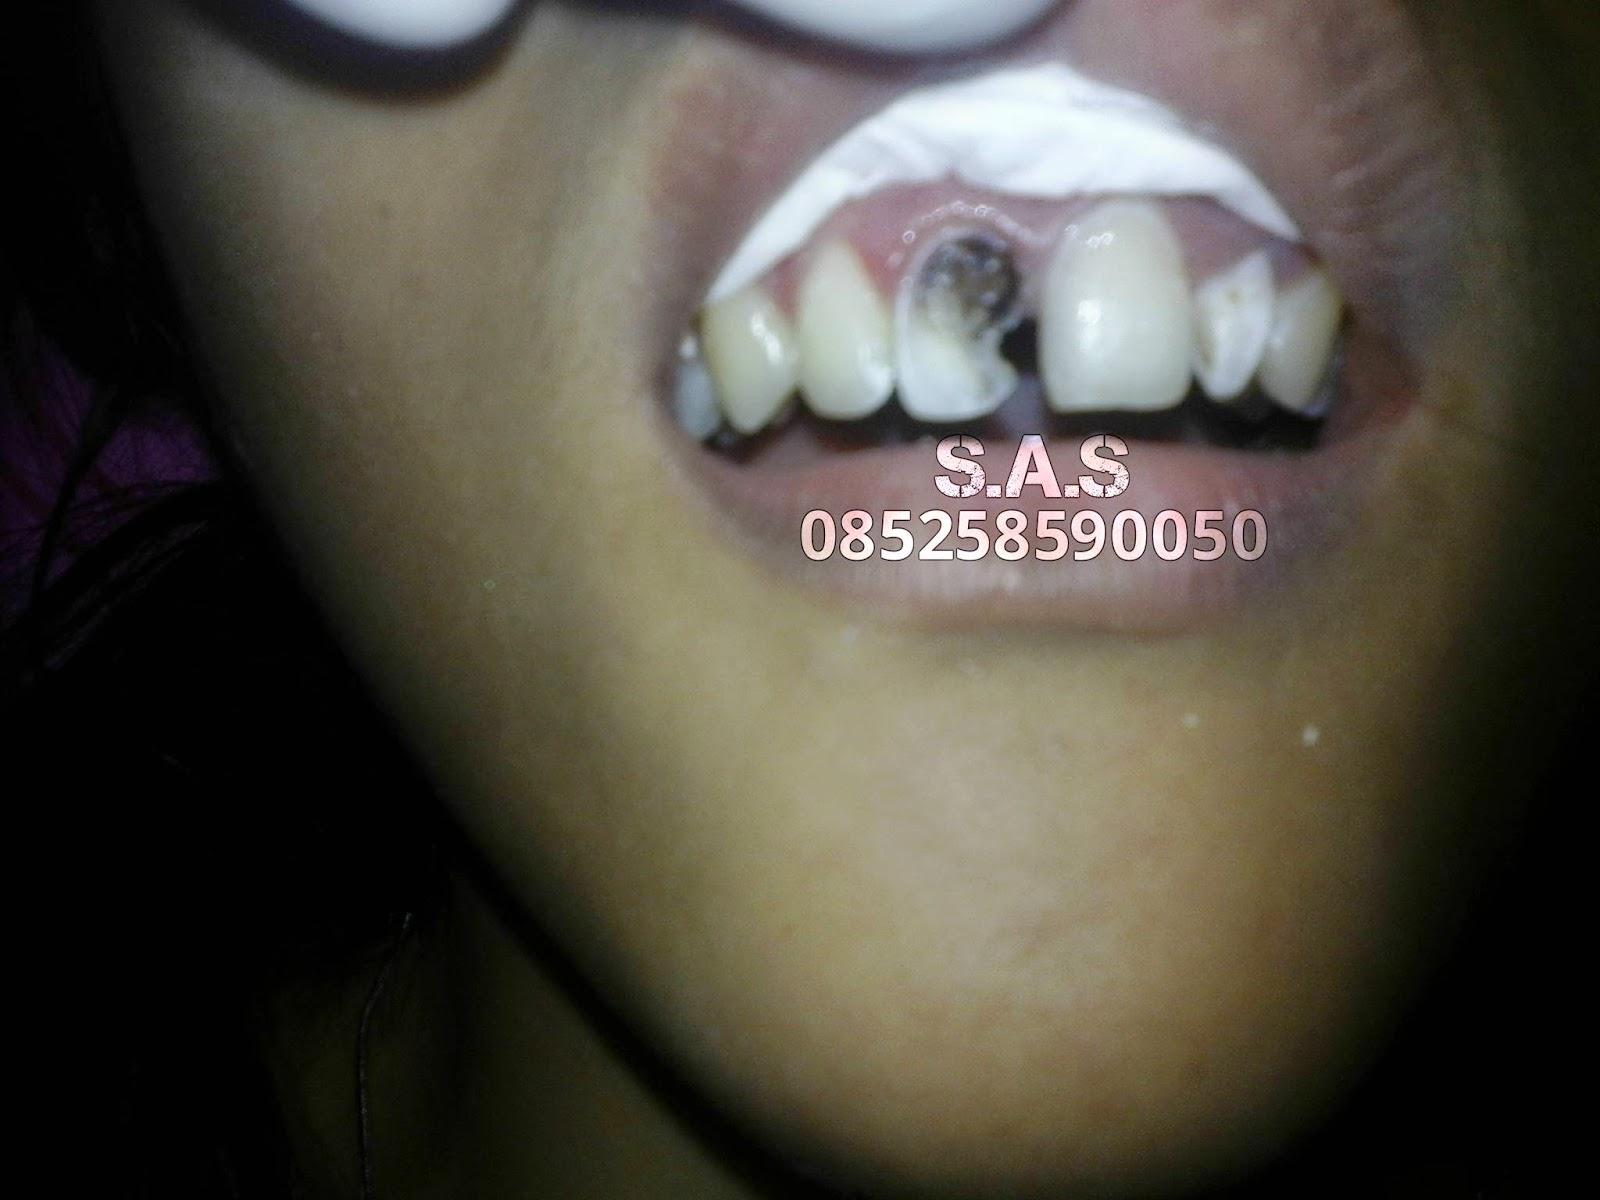 Cara Tukang Gigi S A S Mengembalikan Gigi Berlubang Hitam Dan